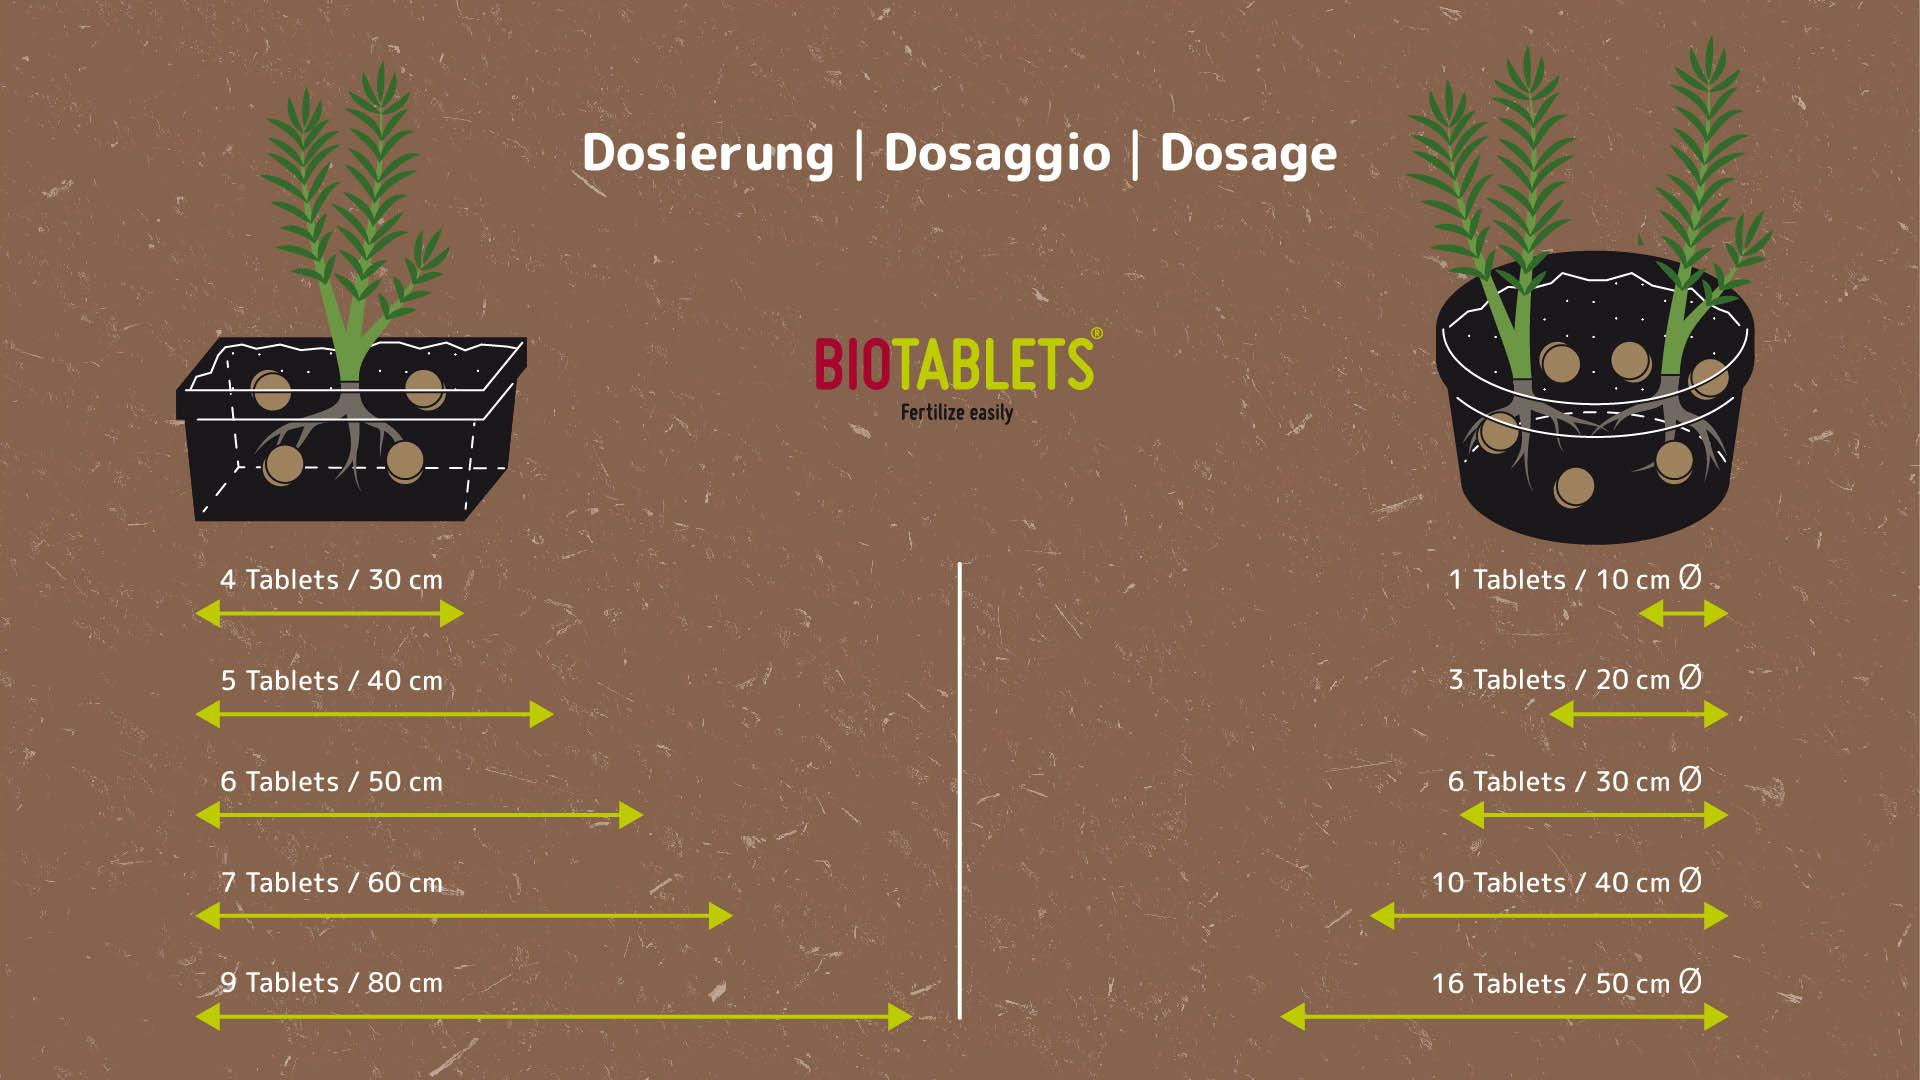 BIOTABLETS Factsheet